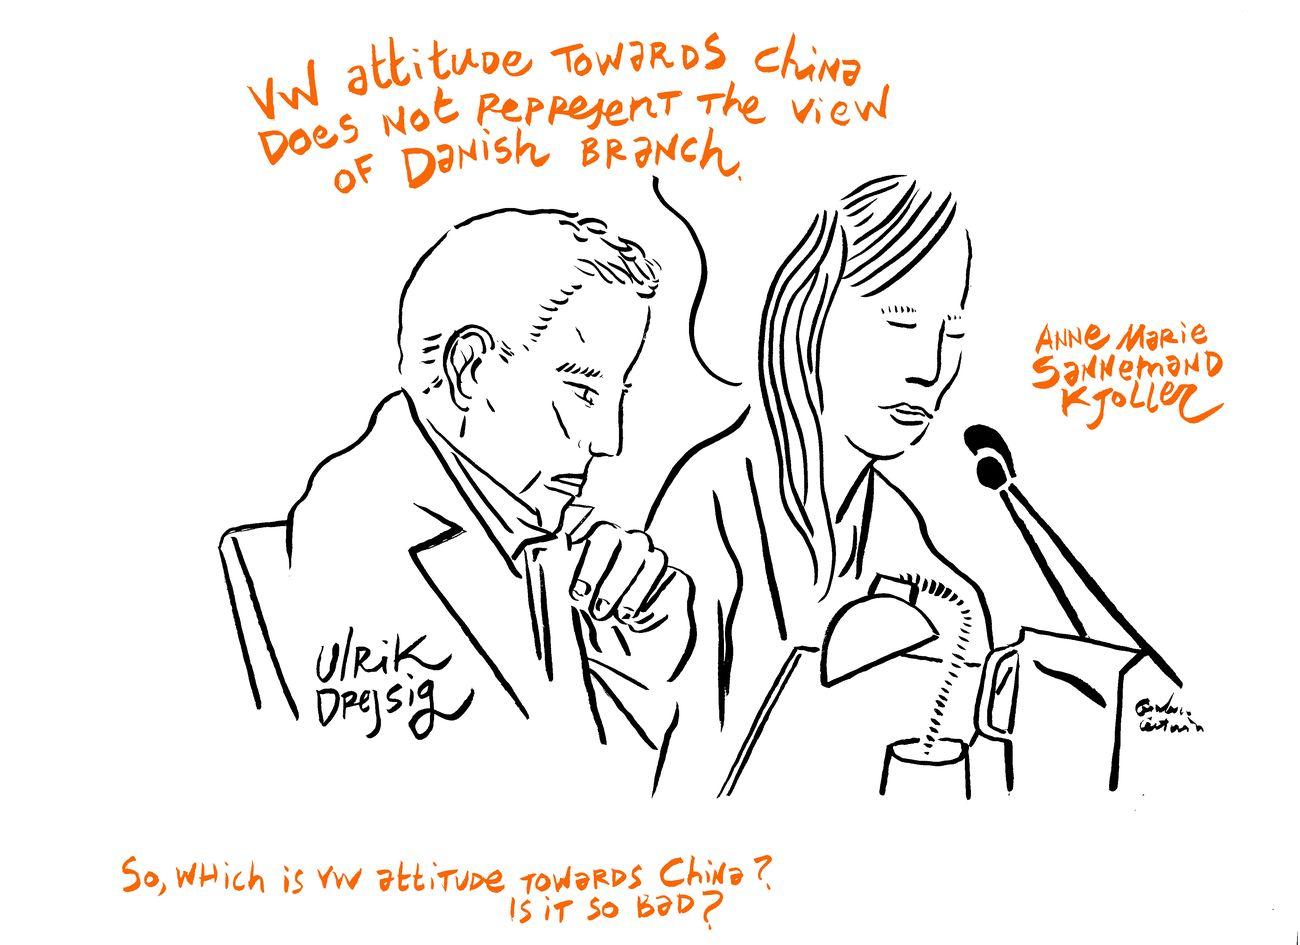 Ai Weiwei contro la Skandinavisk Motor Co. A/S. Ulrik Drejsig e Anne Marie Sannemand Kjøller. Disegno di Gianluca Costantini